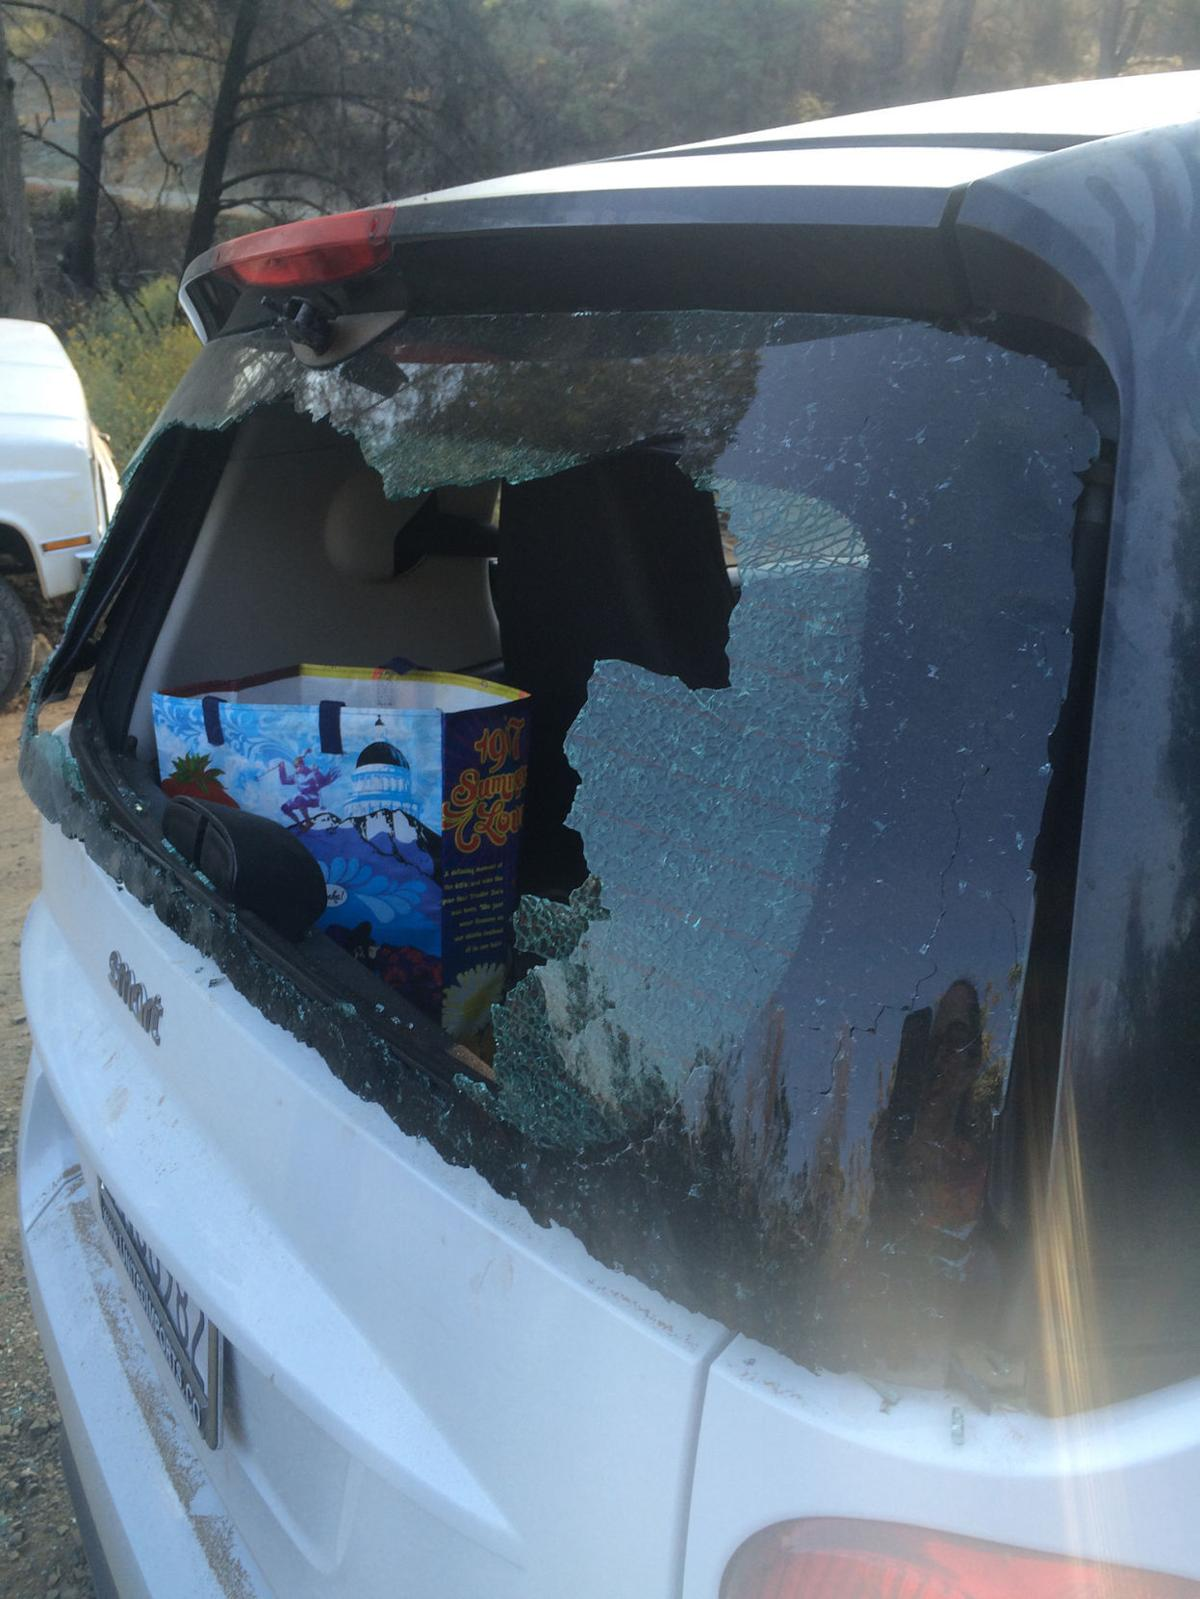 Camping trip gone terribly wrong near Lake Berryessa | Local